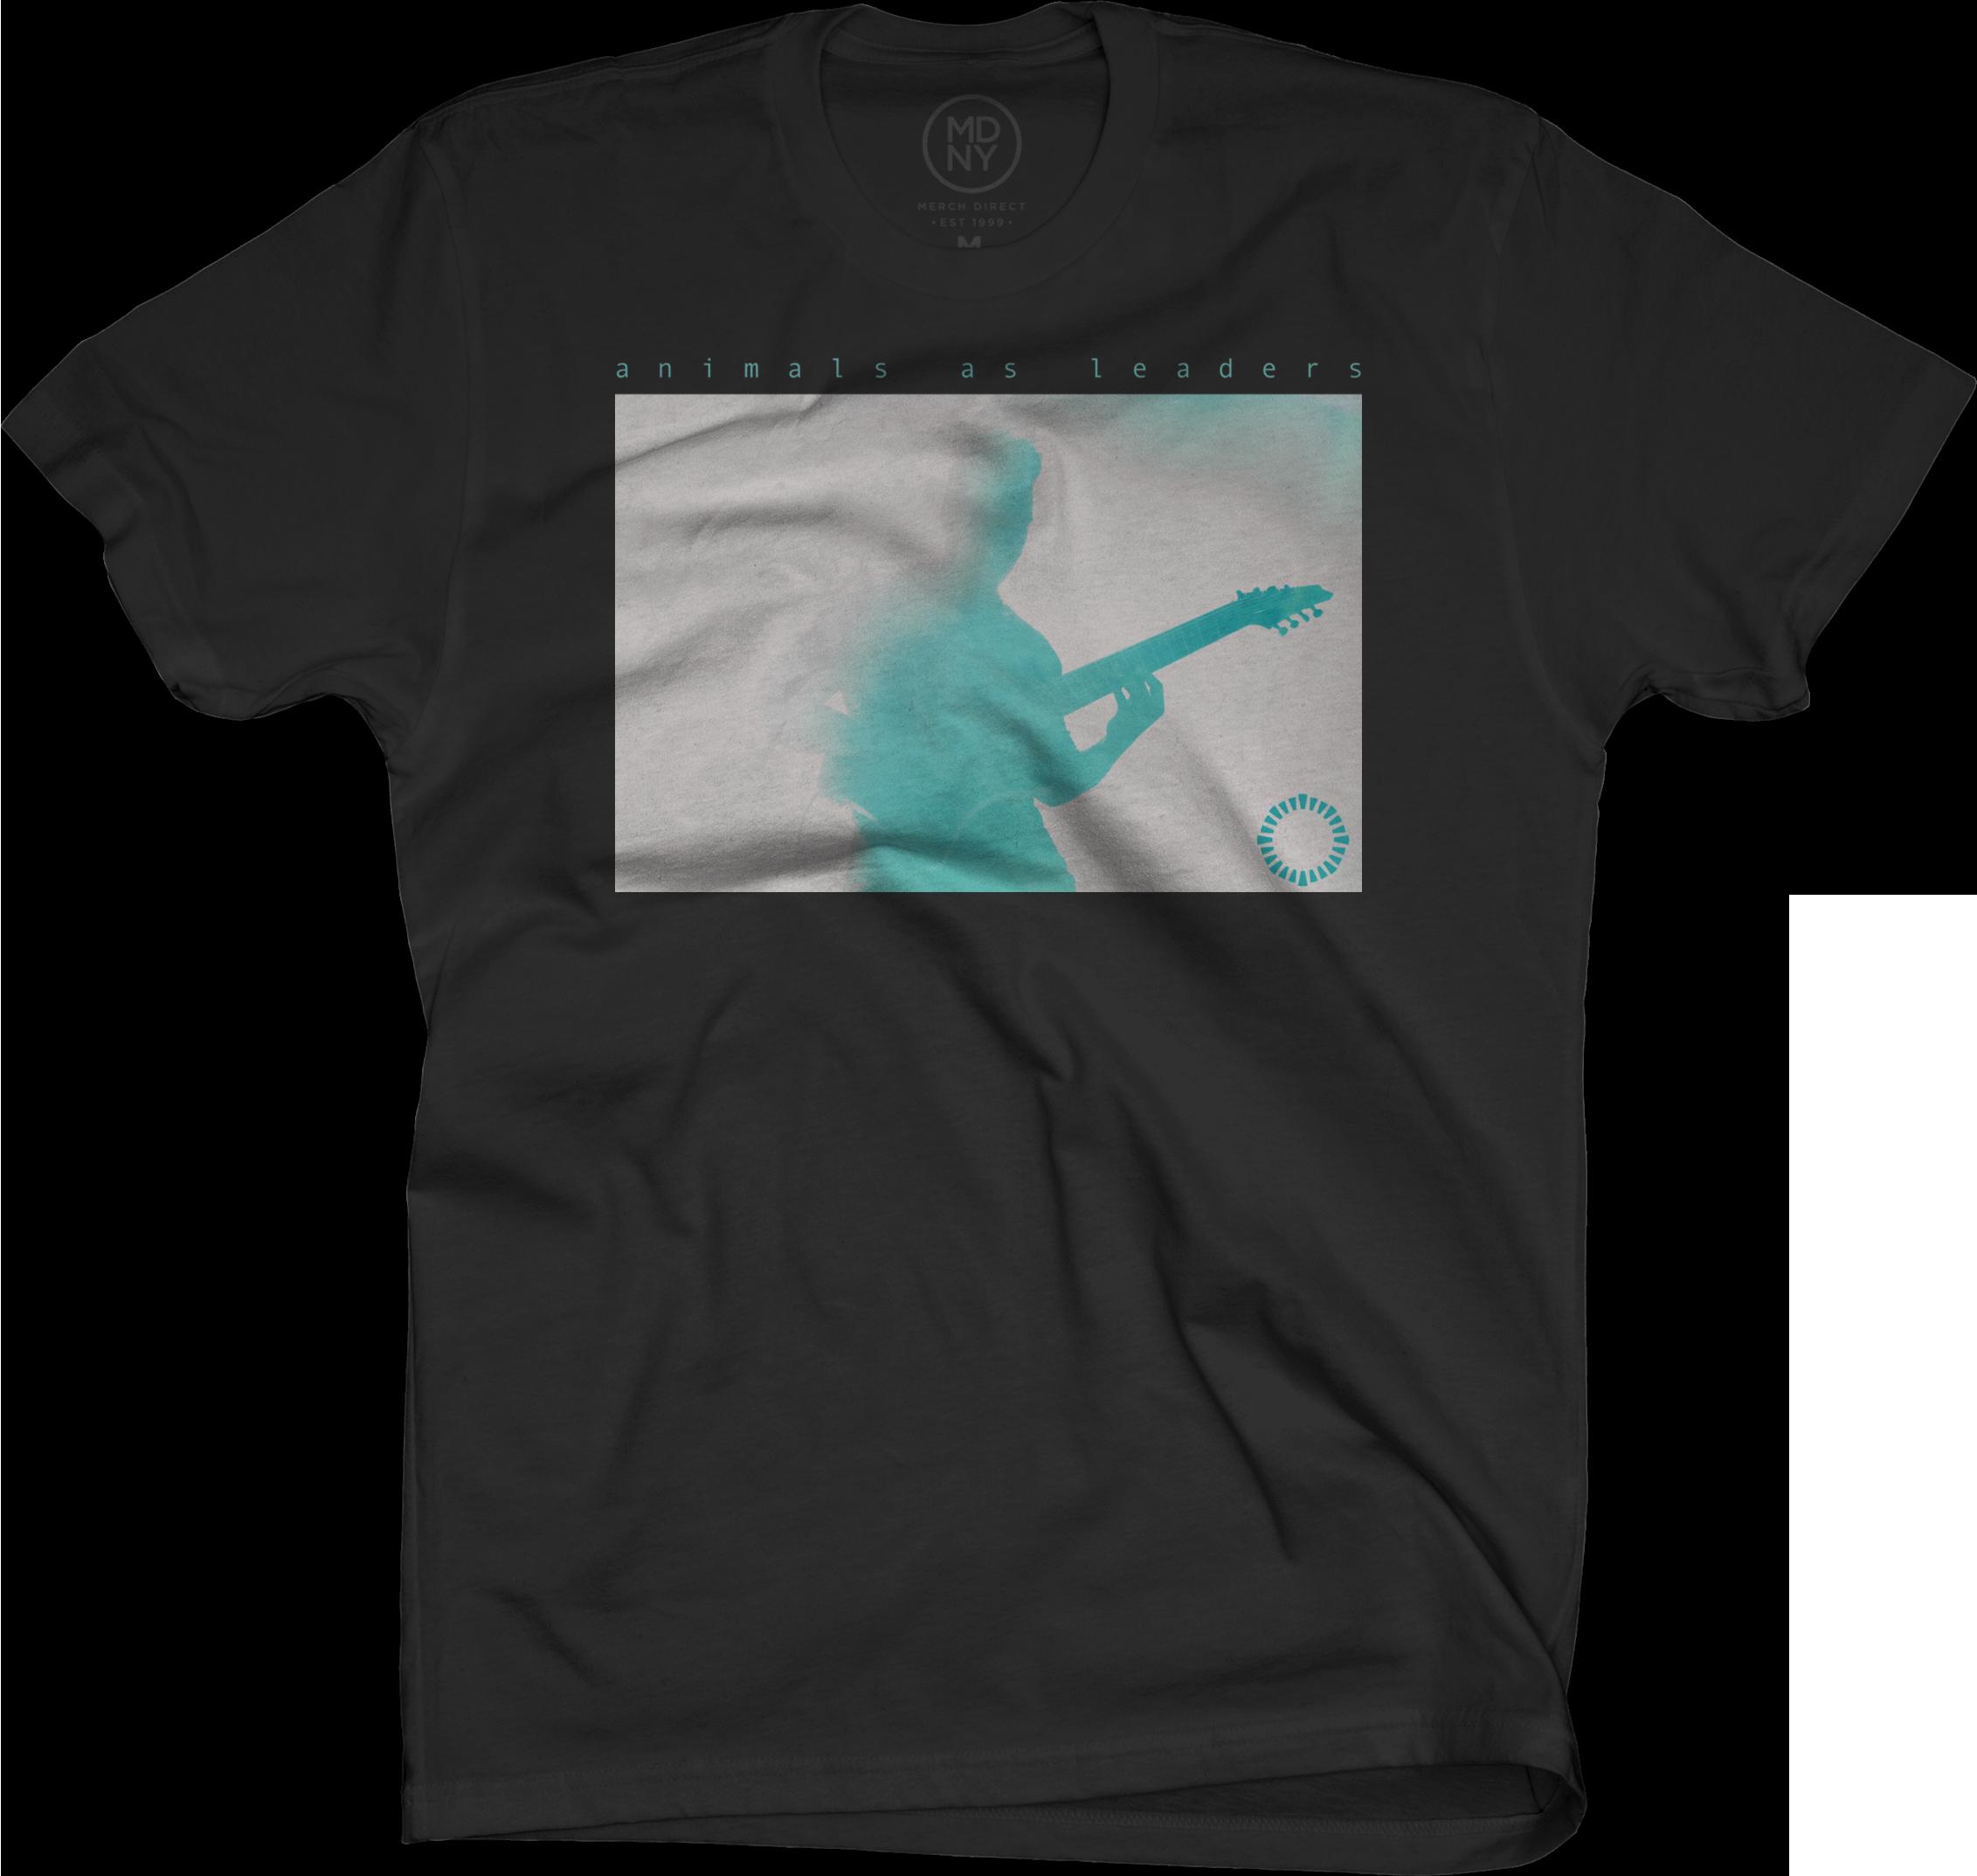 Silhouette Live Shot on Black T-Shirt